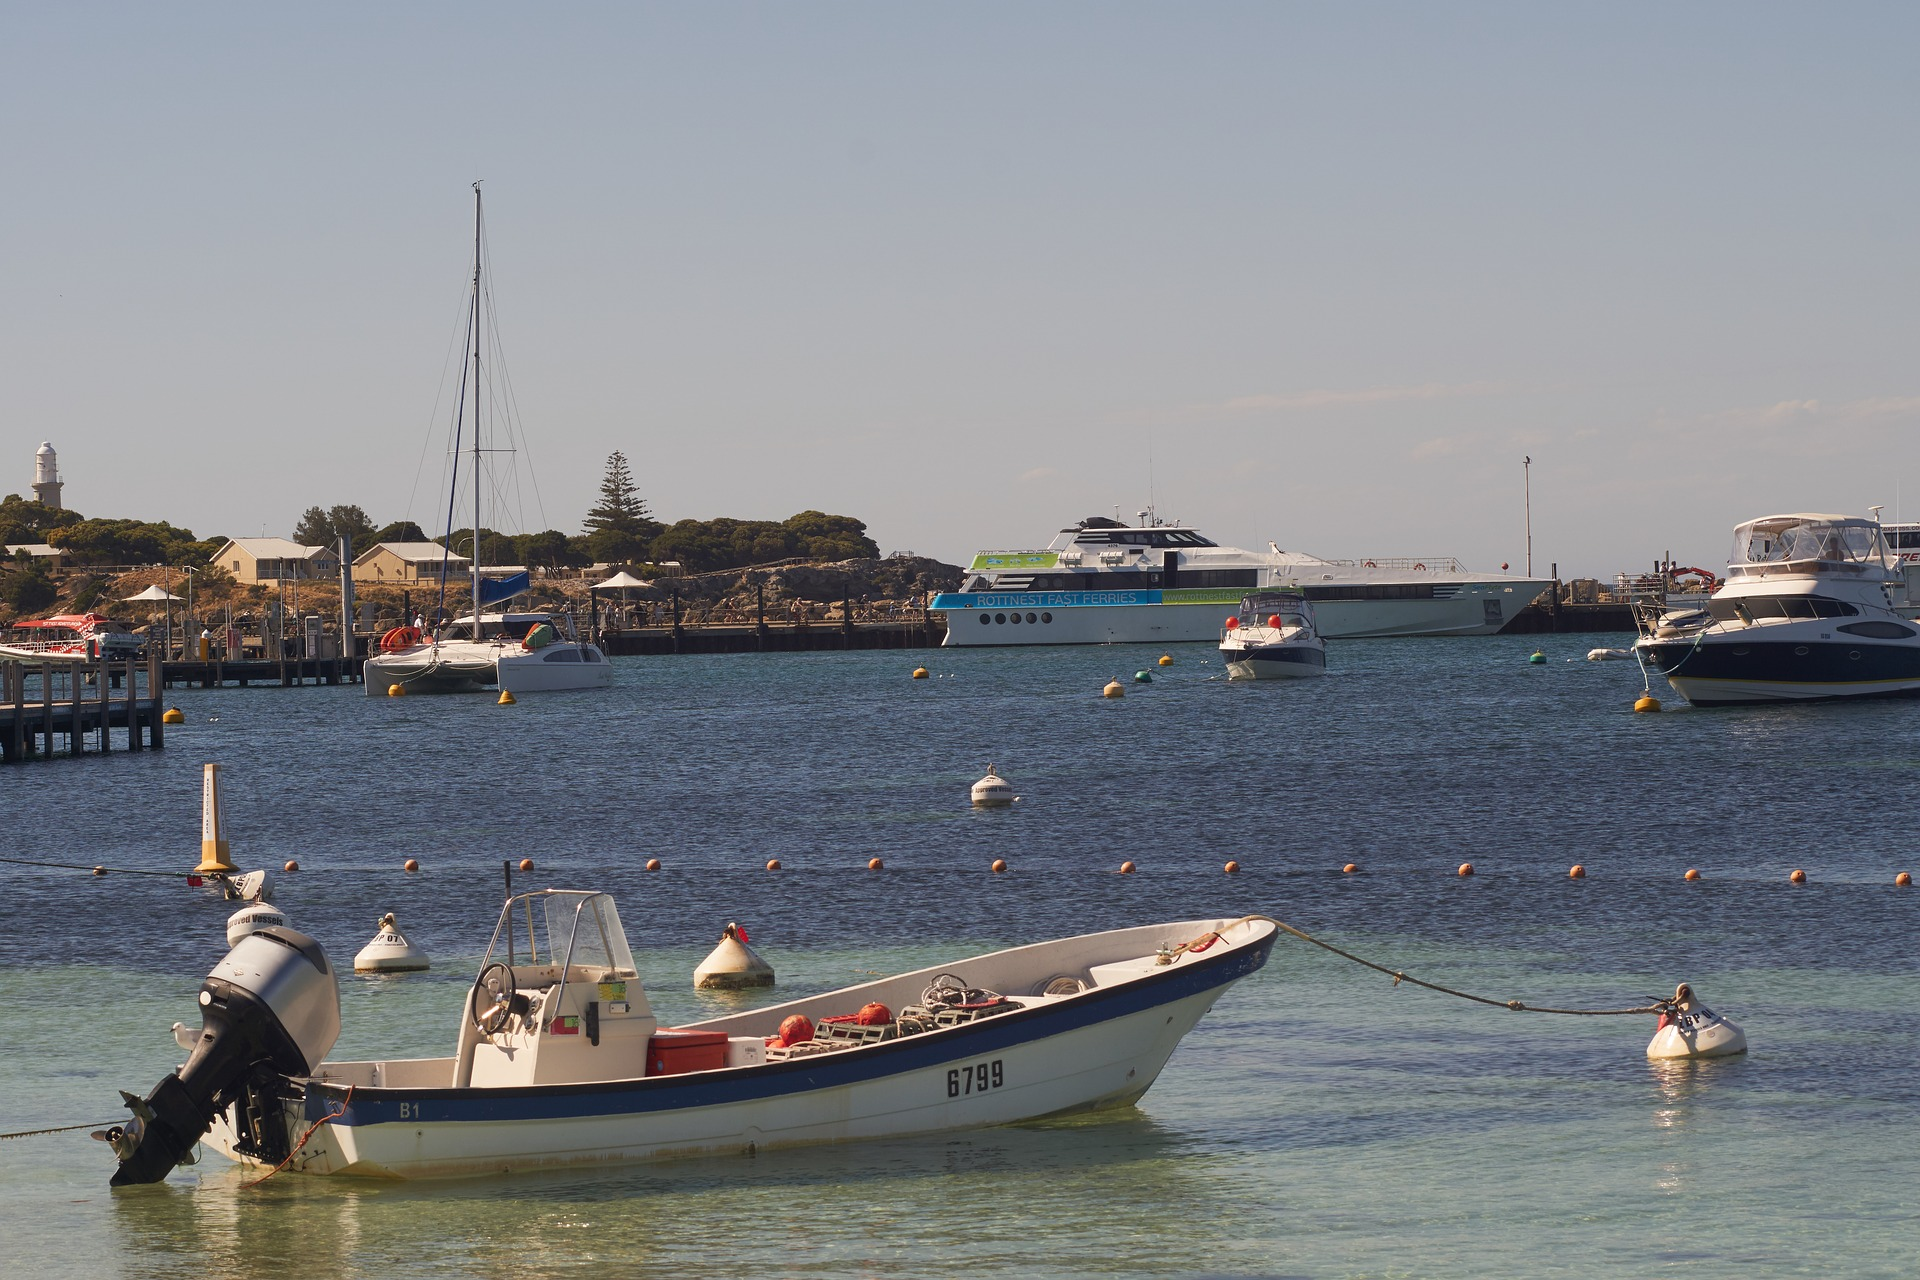 Rottnest Island marina